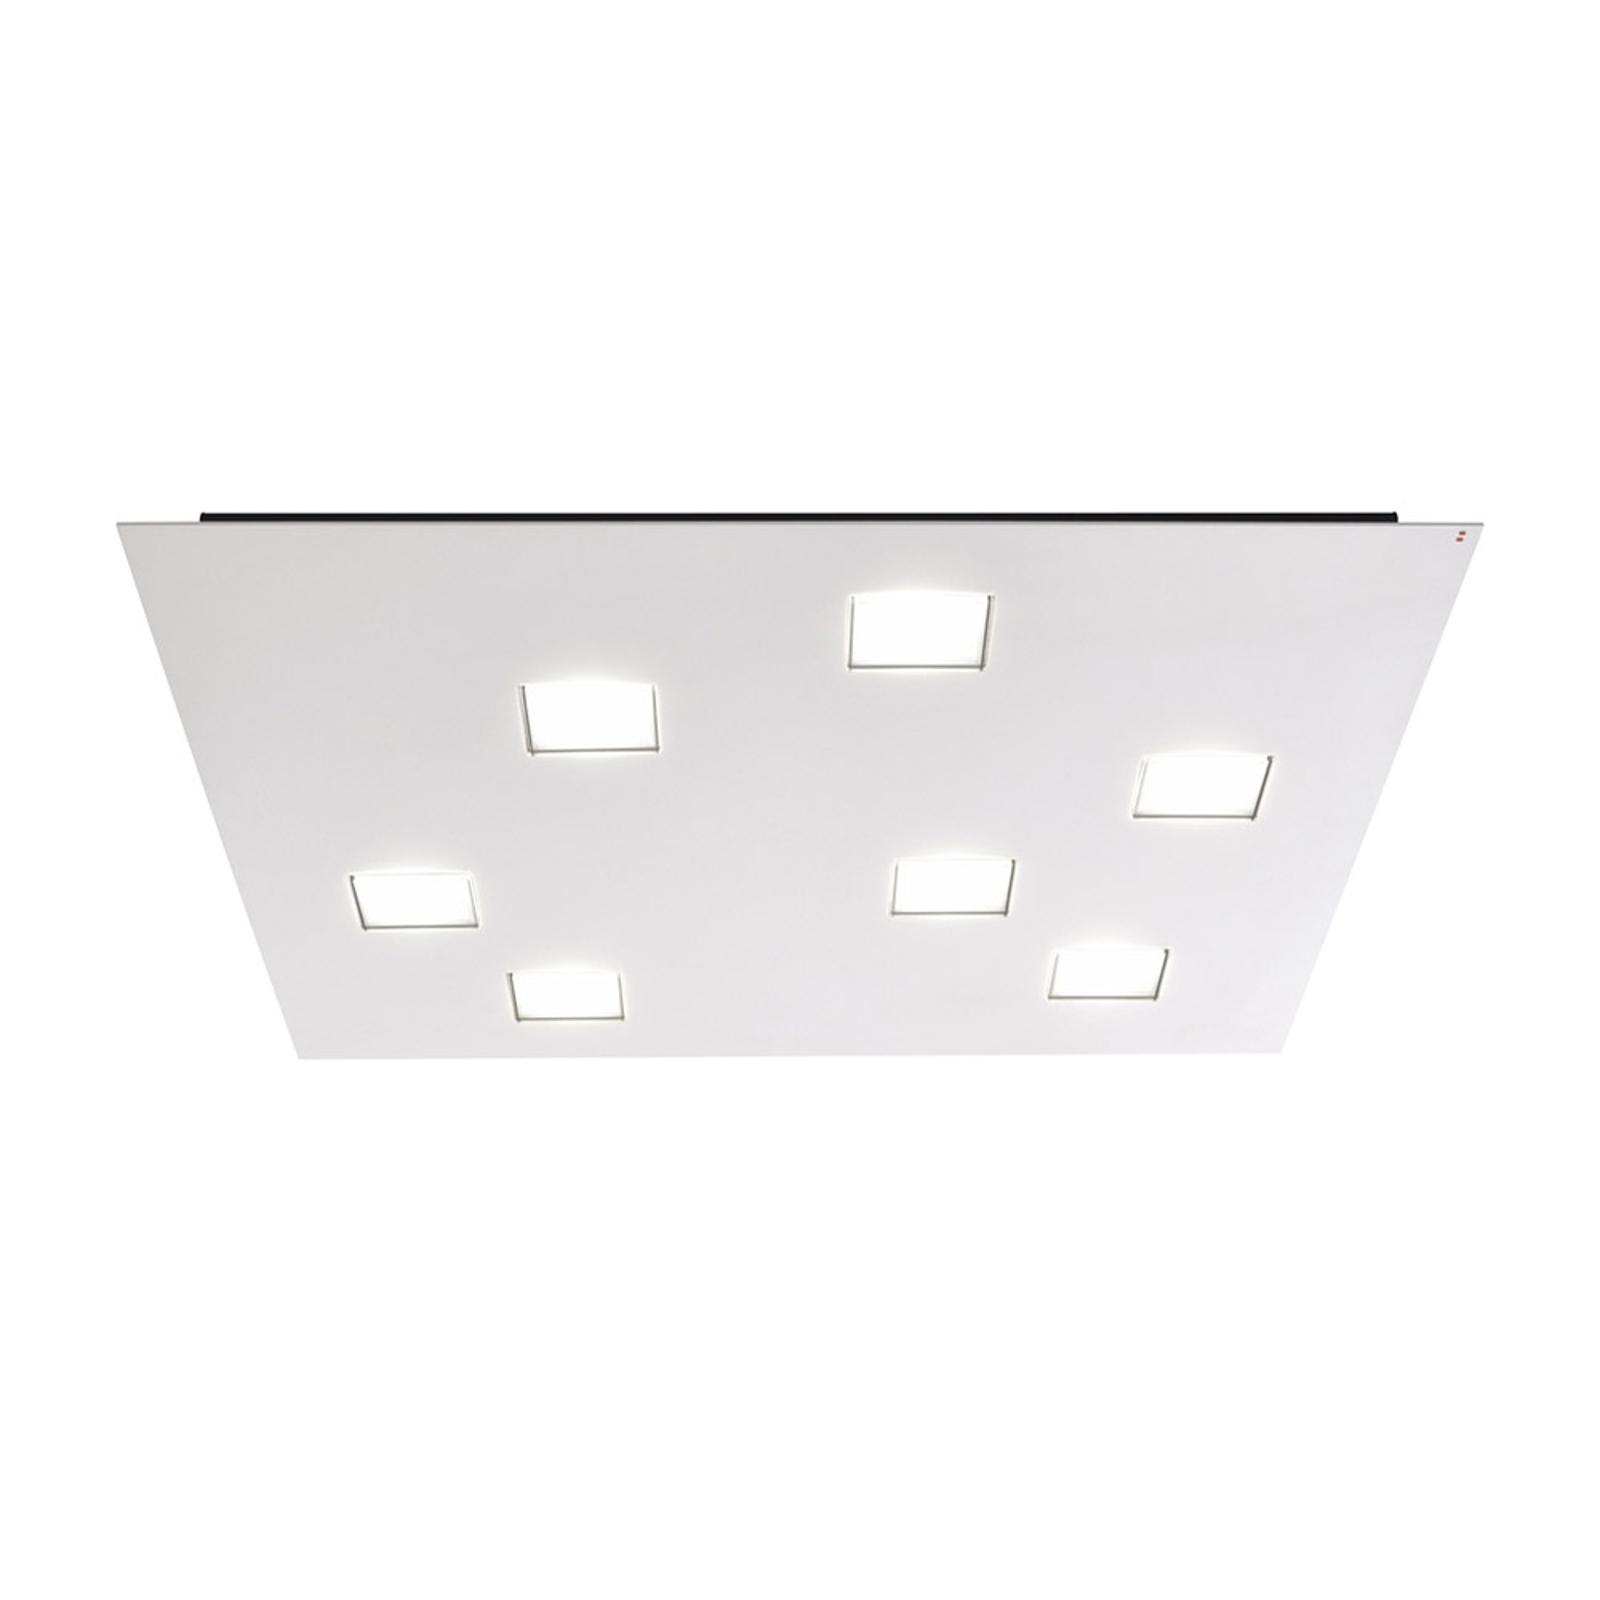 Fabbian Quarter, hvid LED-loftlampe 7 lyskilder